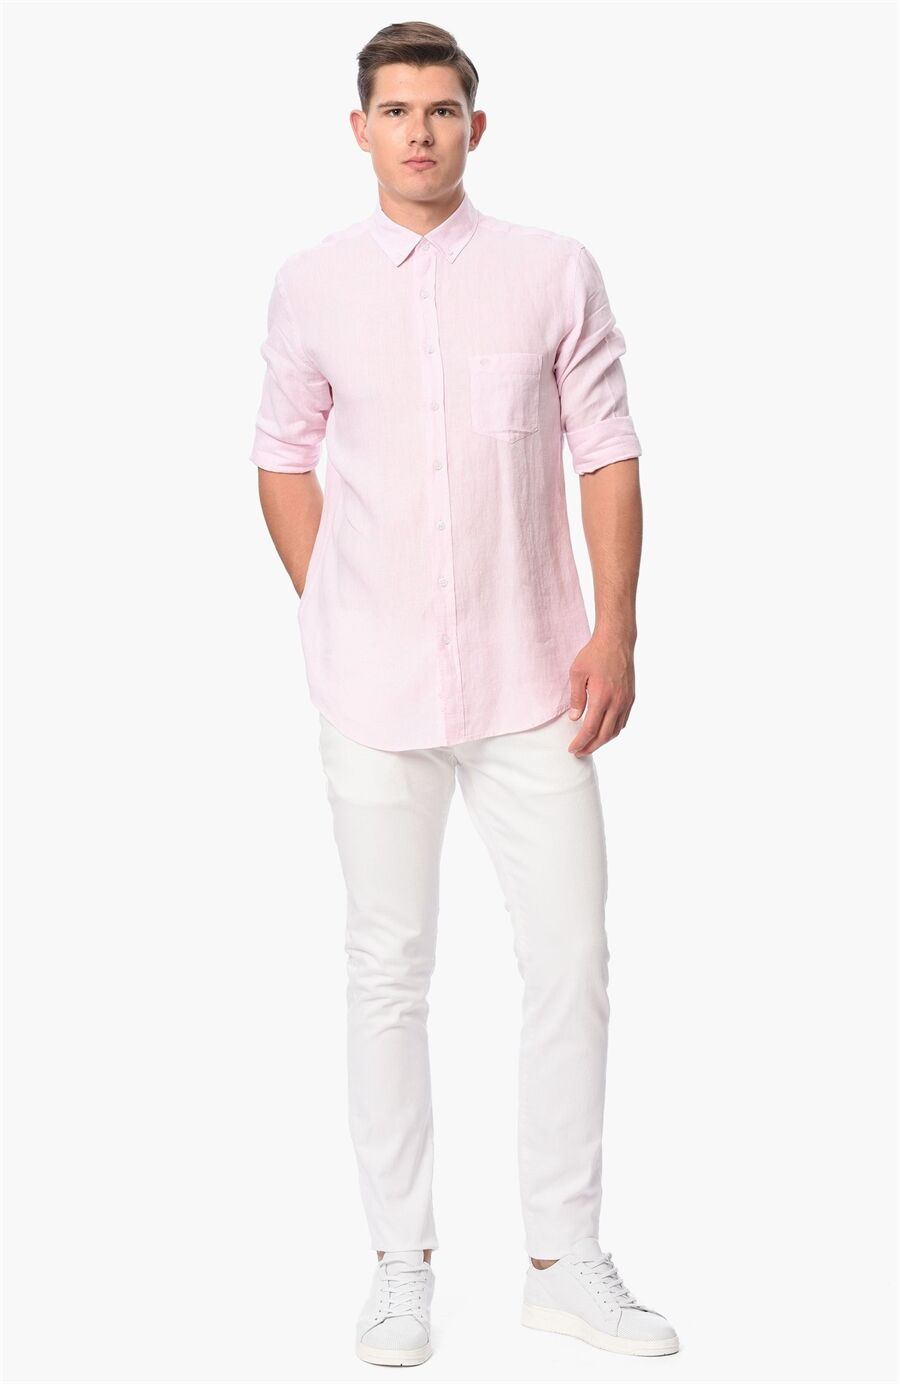 Diyagonal Slım Fit Beyaz Casual Pantolon